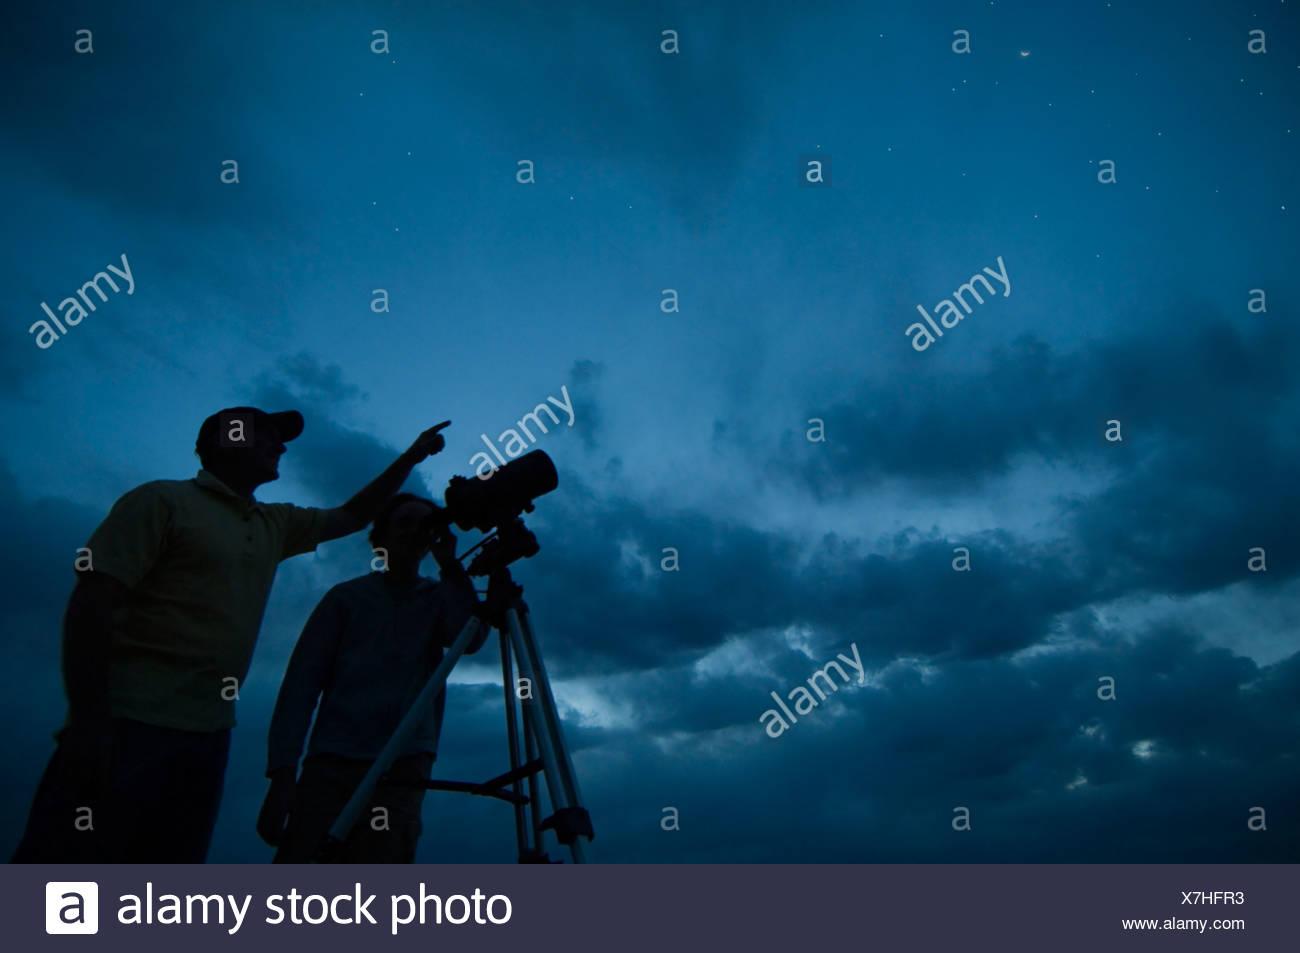 Paar mit teleskop auf stativ stockfoto bild alamy